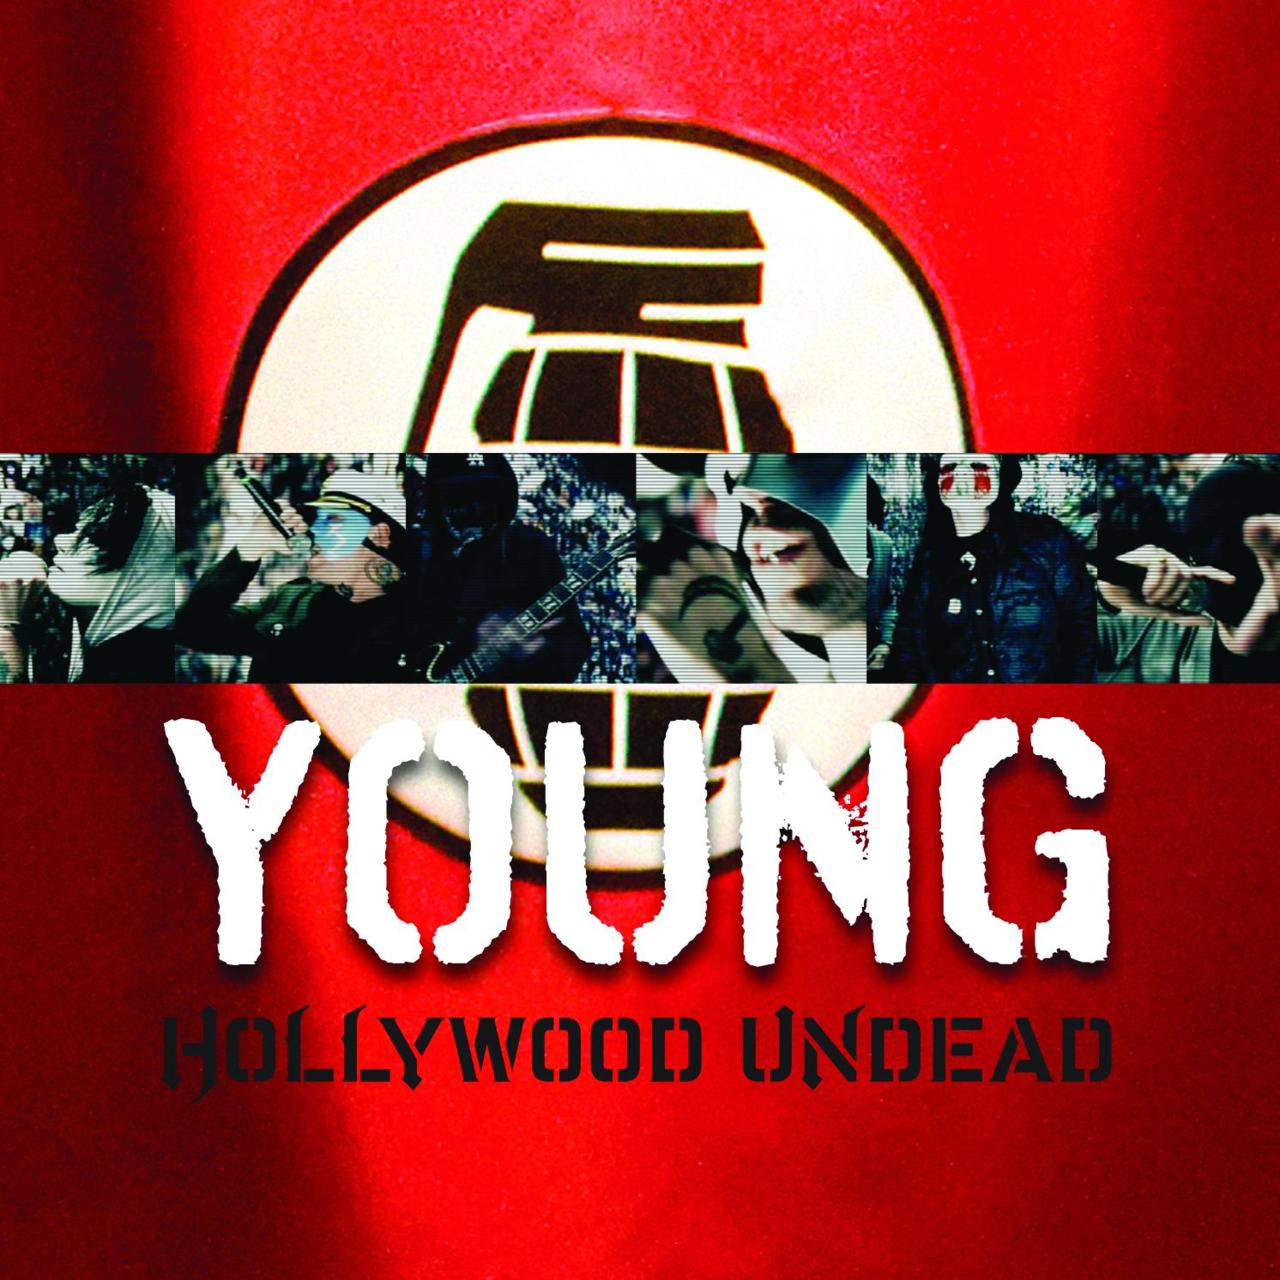 Hollywood undead singles